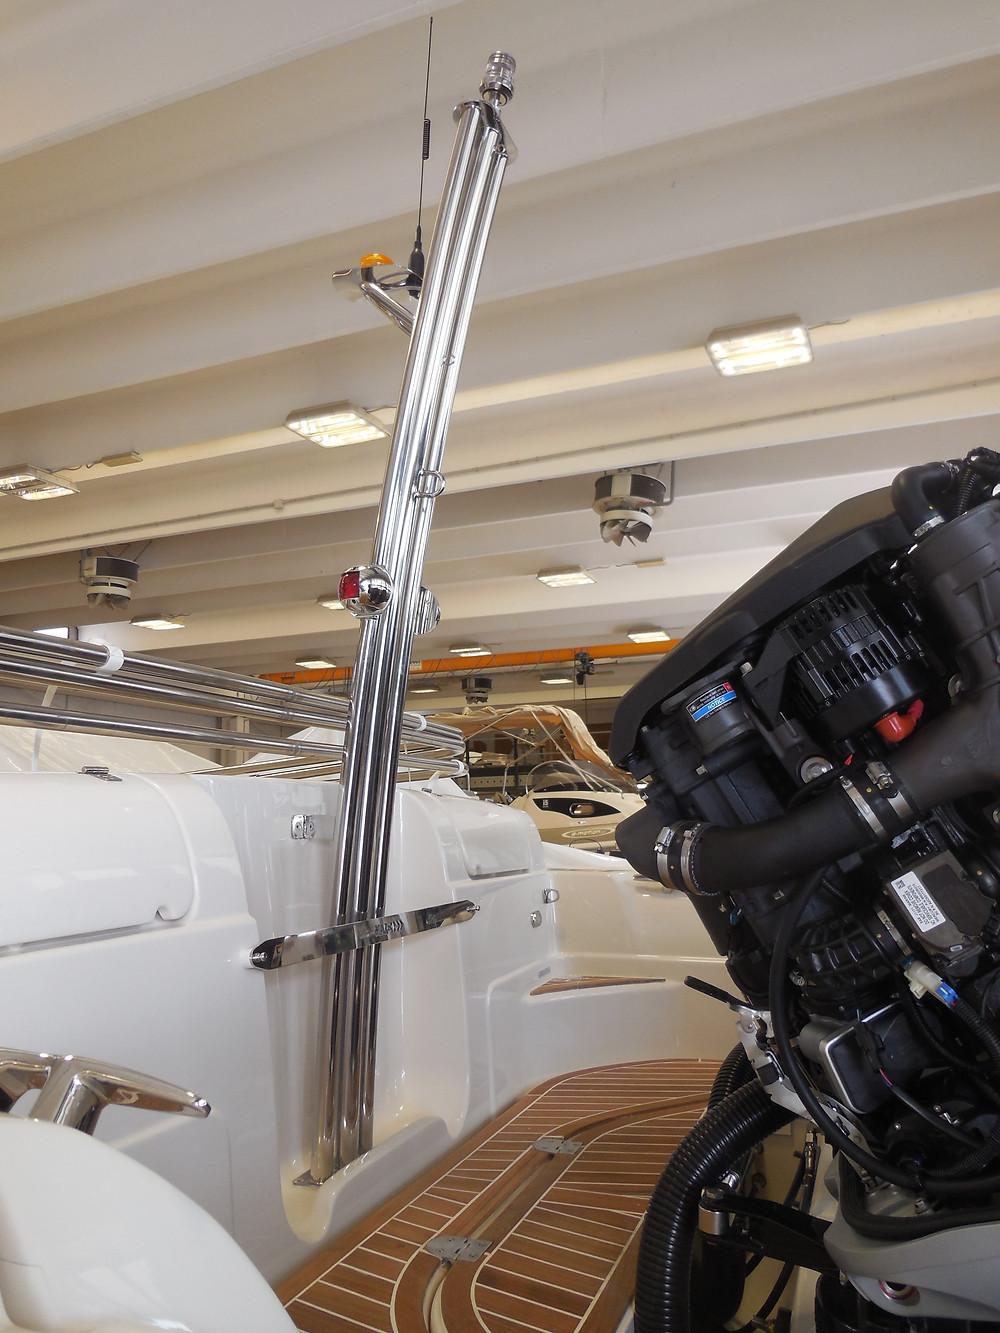 MAR.CO twentysix 8.43 meters rigid inflatable boat mat de ski